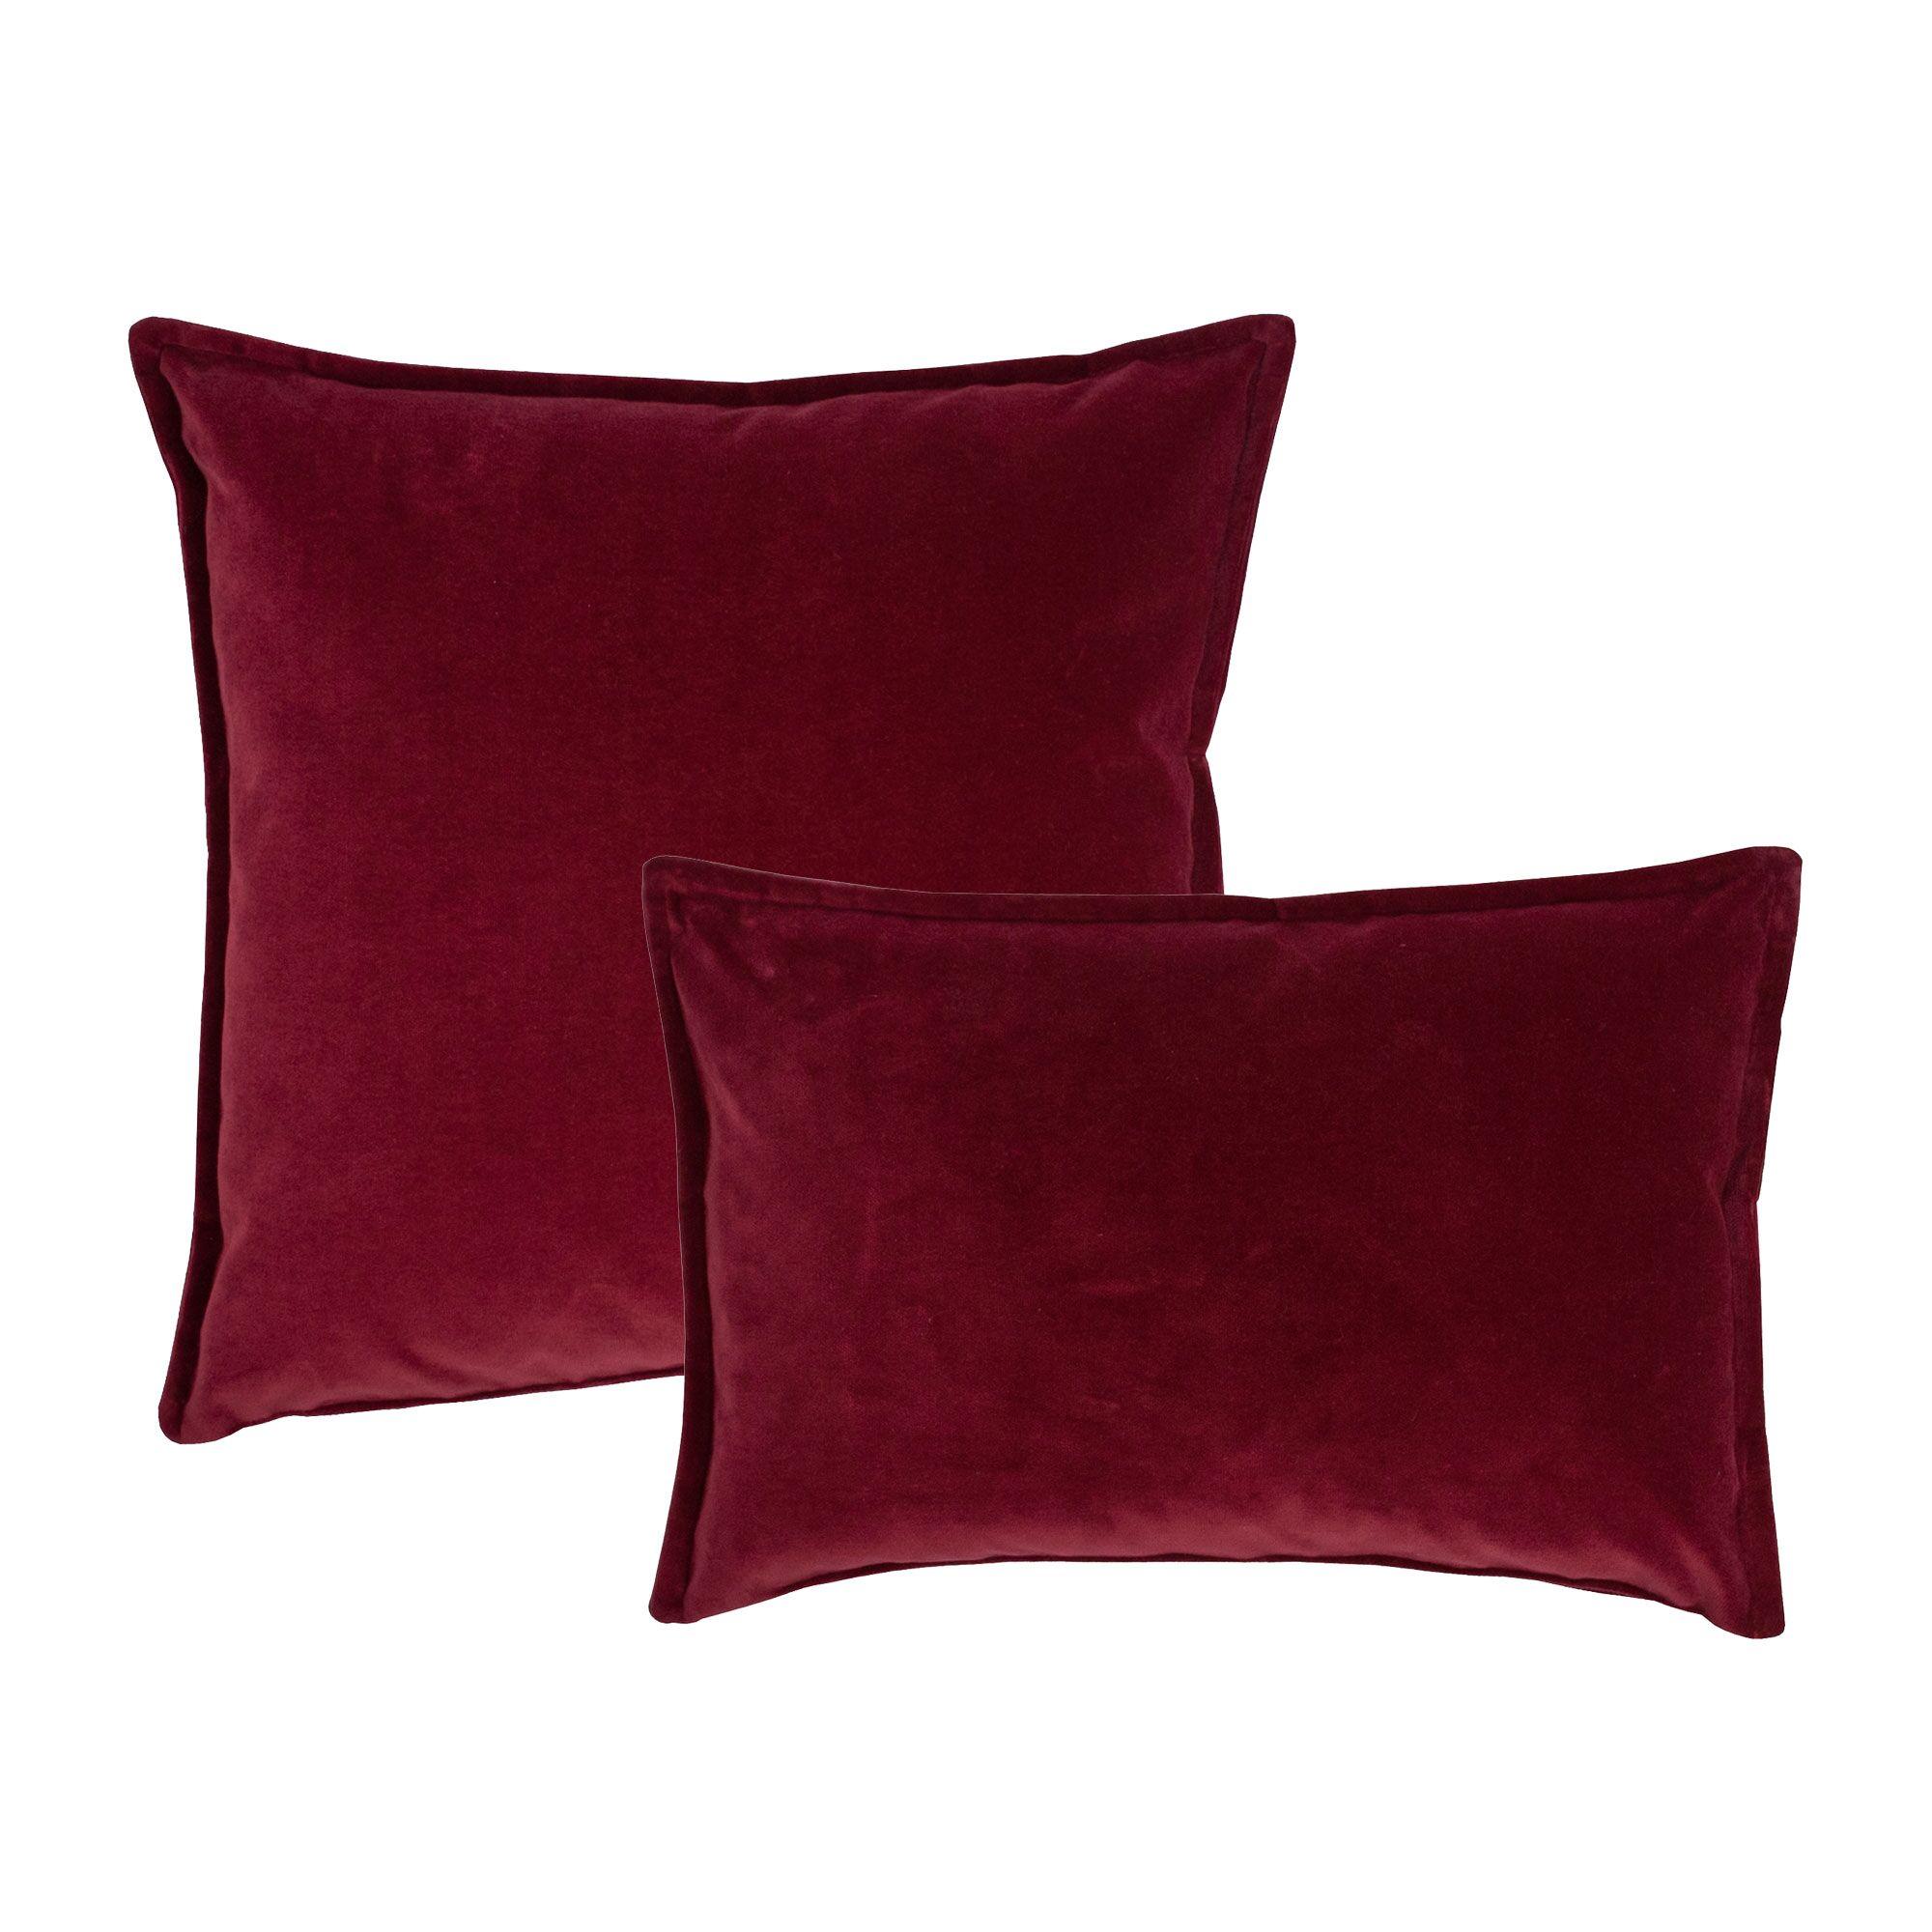 Valerie Combo Decorative 2 Piece Pillow Set Color: Red